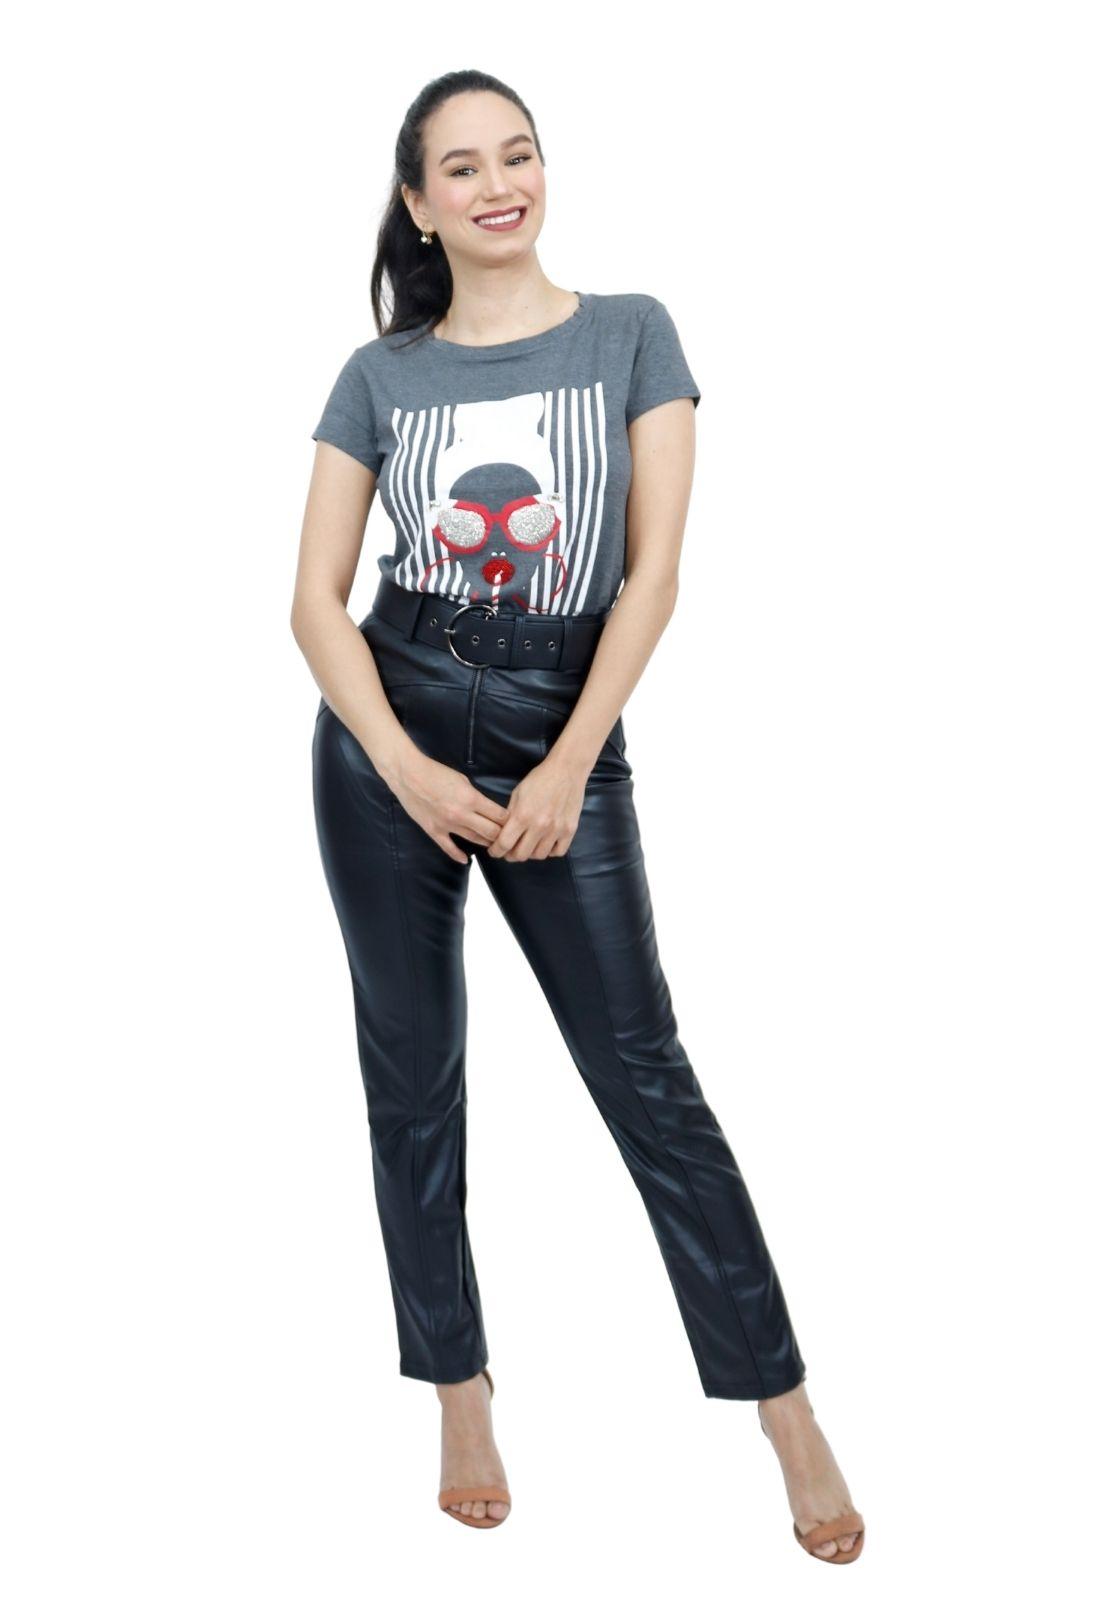 Camiseta Feminina T-Shirt Viscolycra Bordada Pedrarias